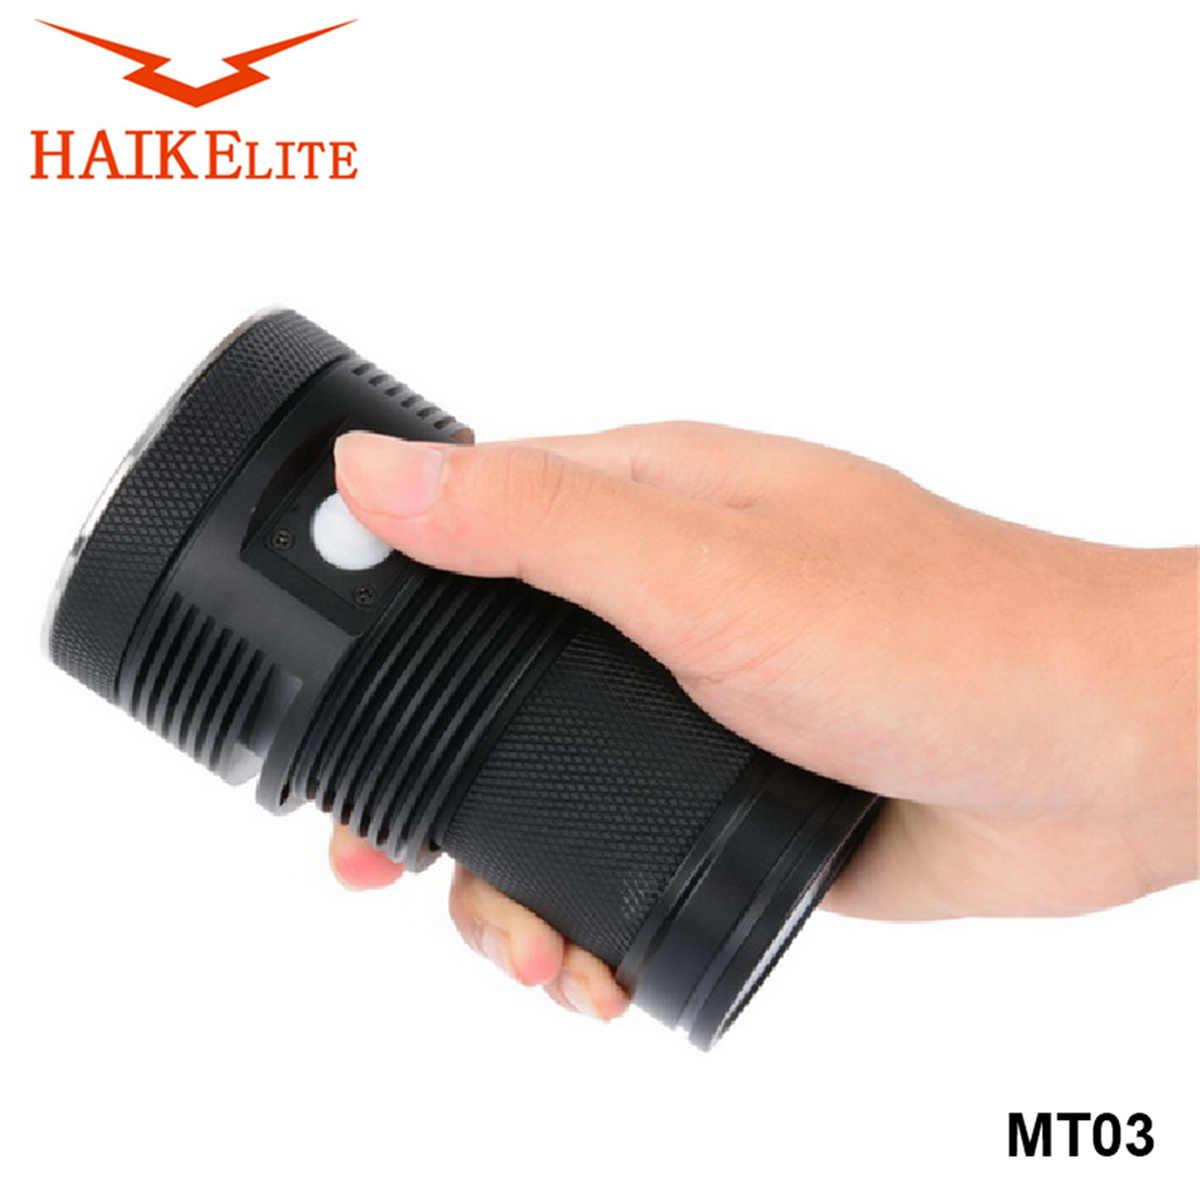 HaikeLite MT03 Đèn Pin LED XHP70.2 21000LM Cao Cấp Đèn Cắm Trại Đèn Pin Đèn  Khẩn Cấp Đèn|Self Defense Supplies